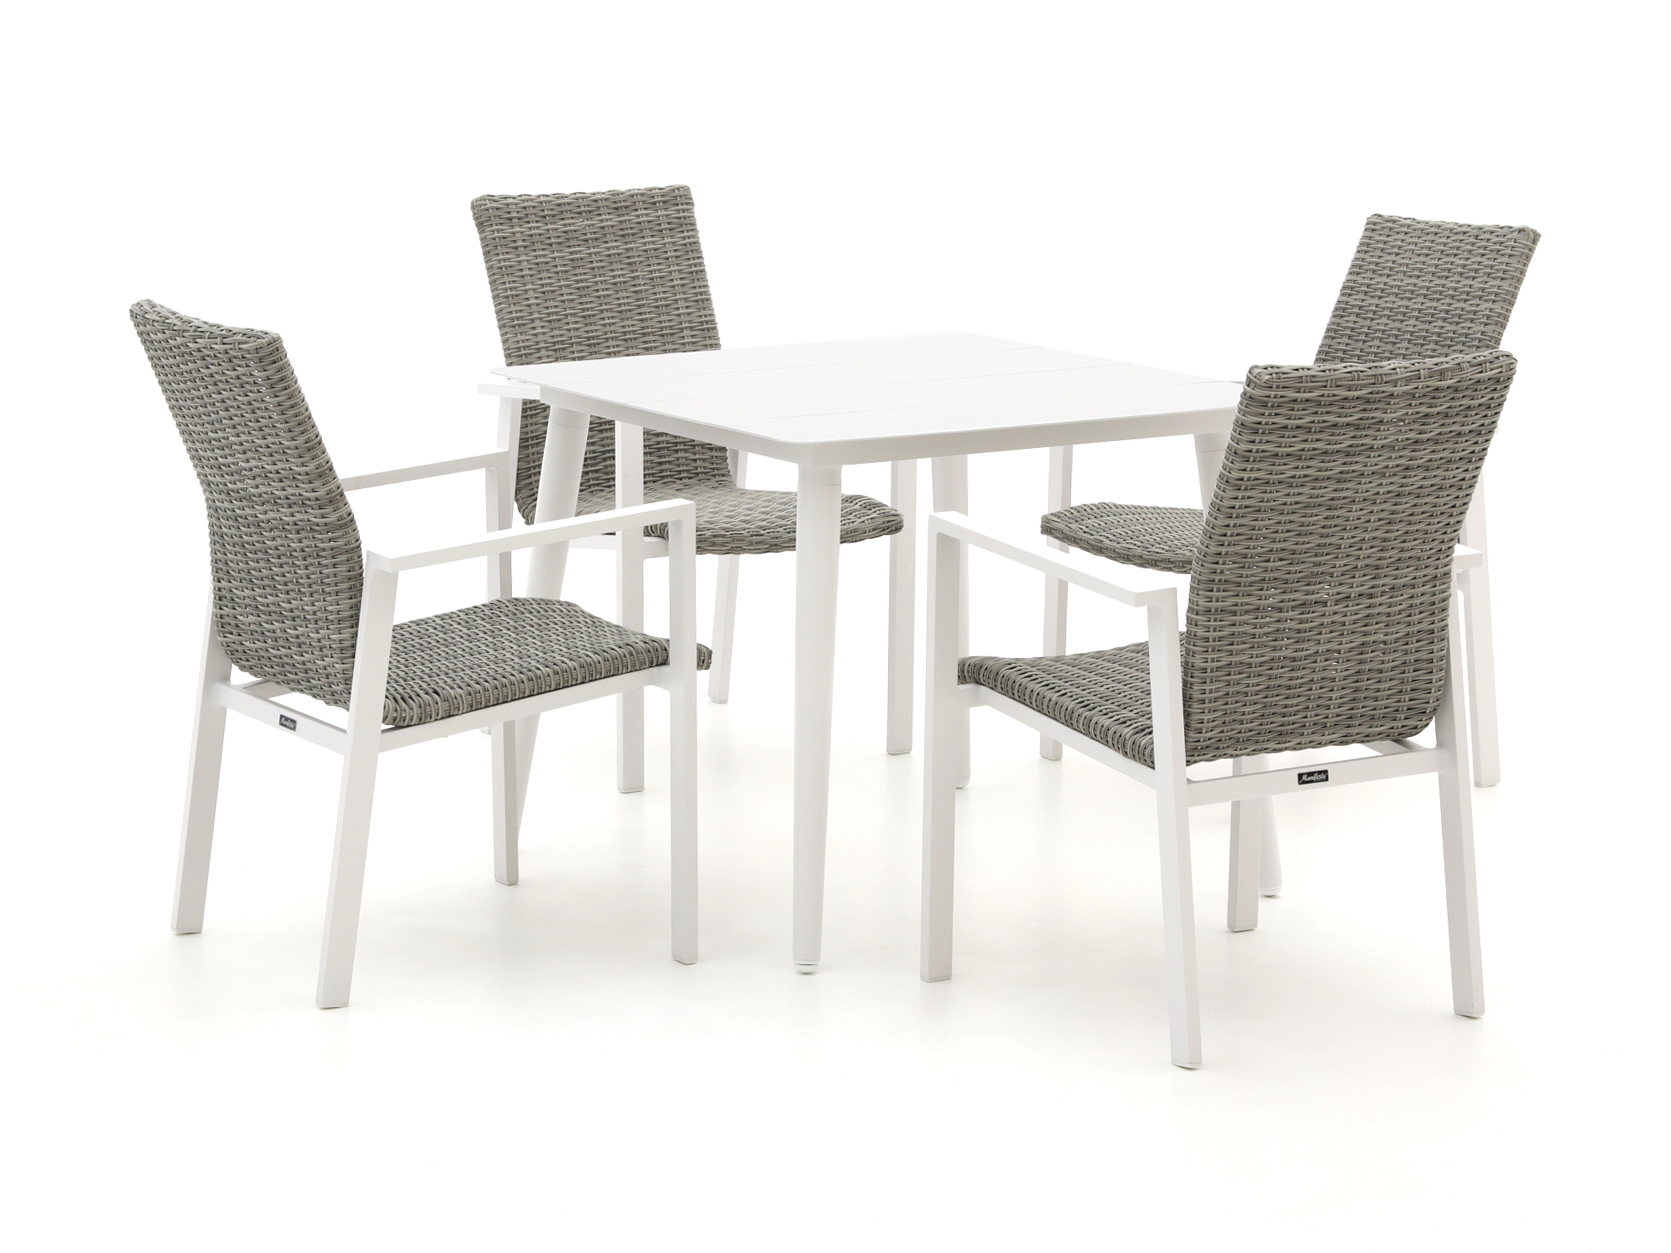 Manifesto Villongo/Sora 90cm dining tuinset 5-delig stapelbaar - Laagste prijsgarantie!